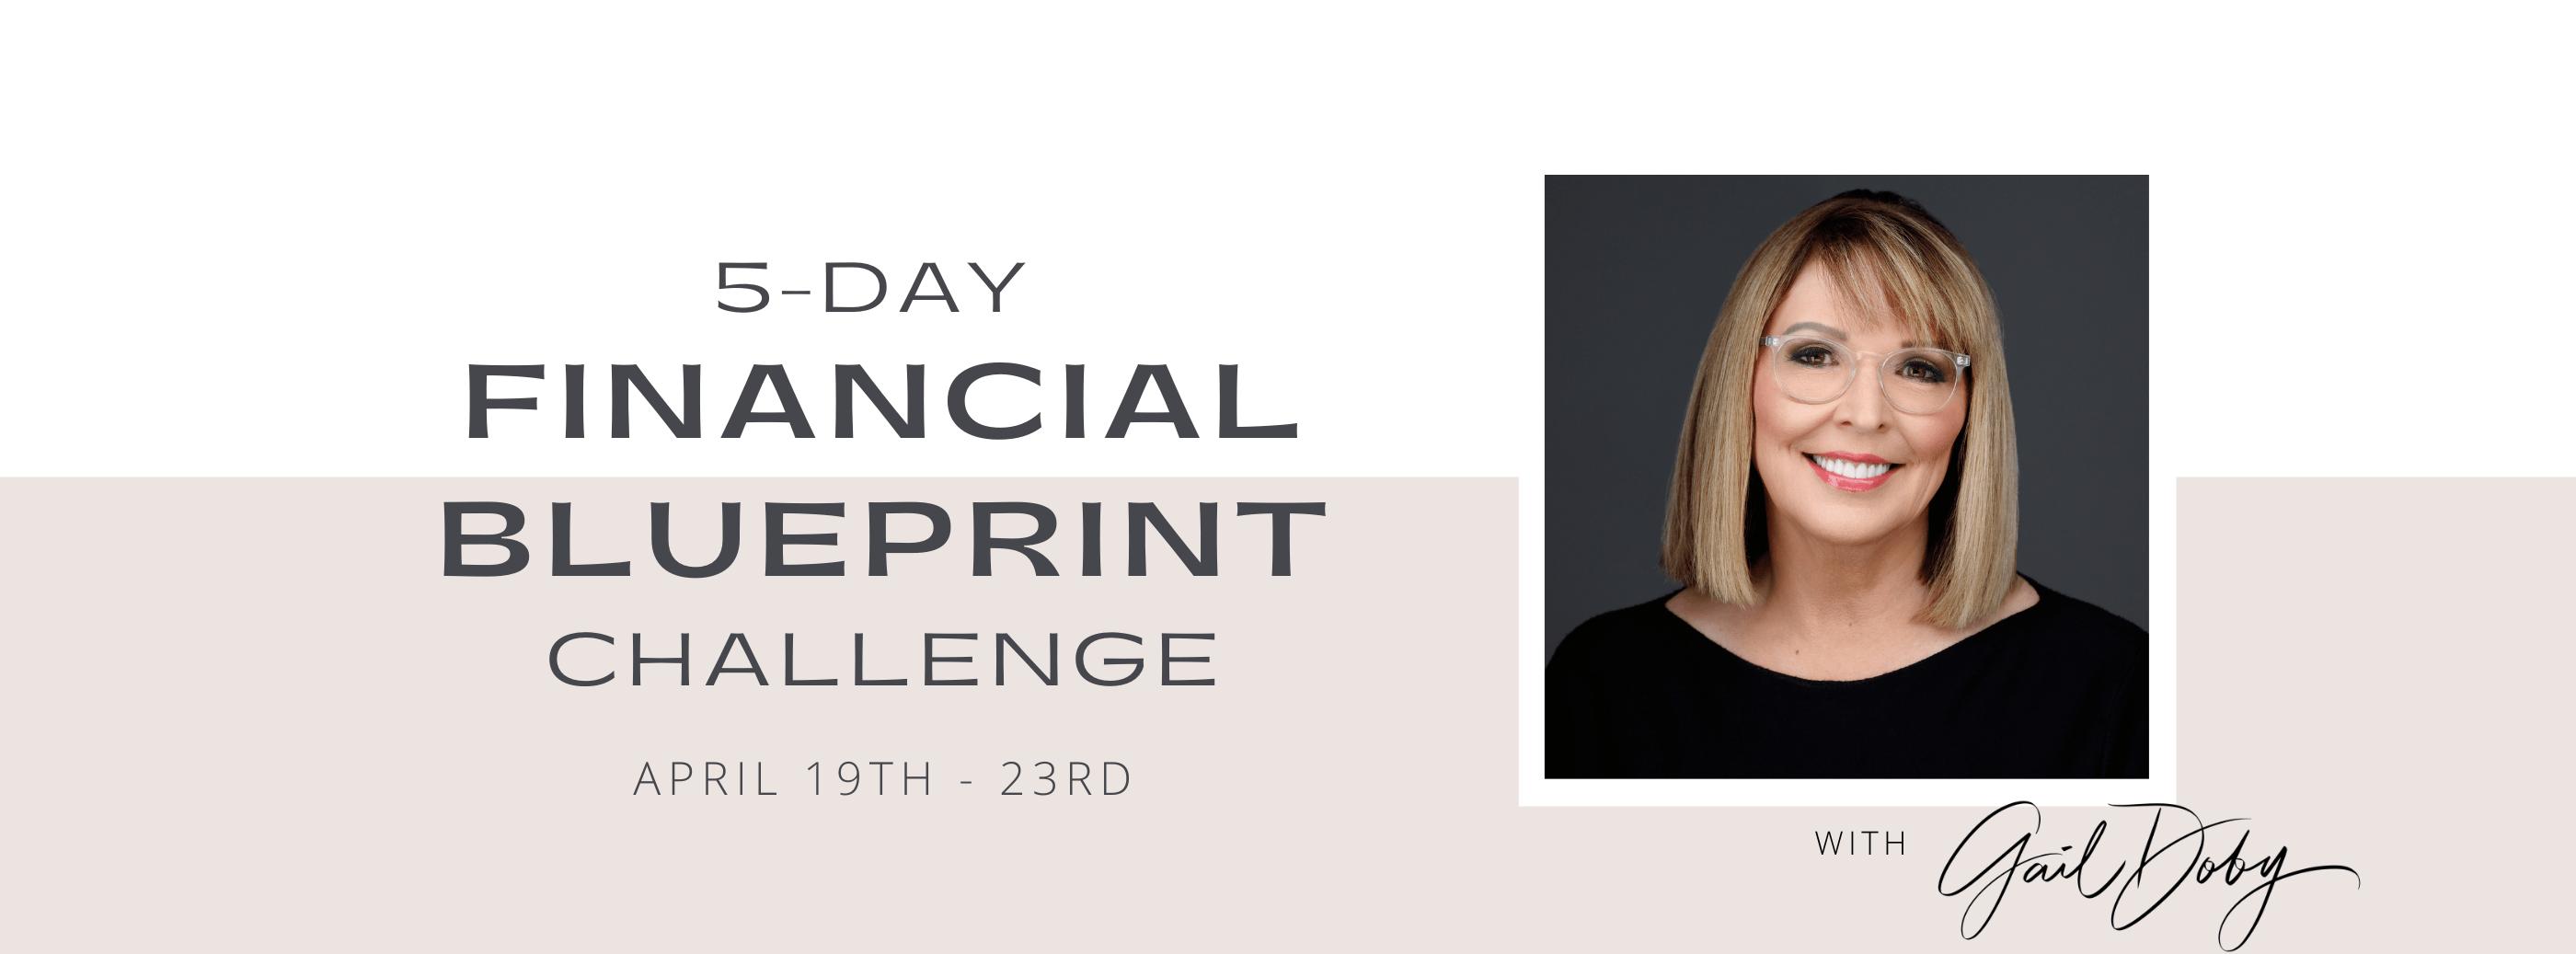 5 Day Financial Blueprint Challenge